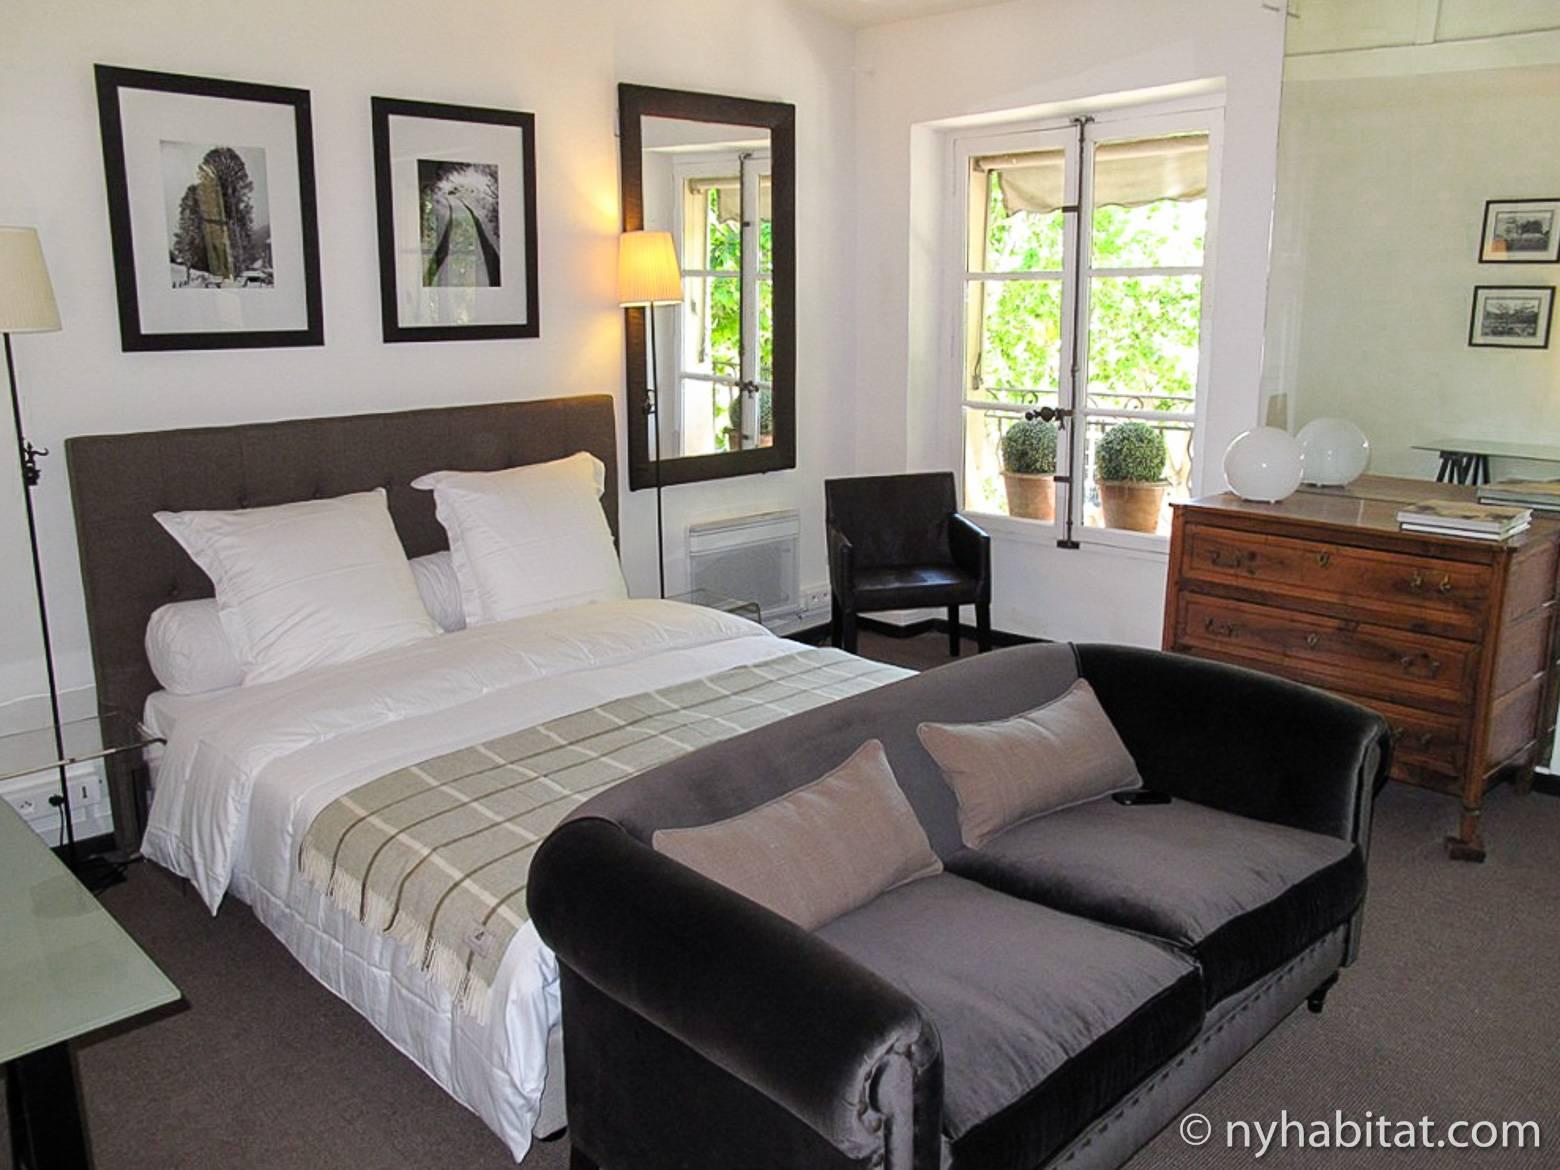 Image of a bedroom in Aix-en-Provence